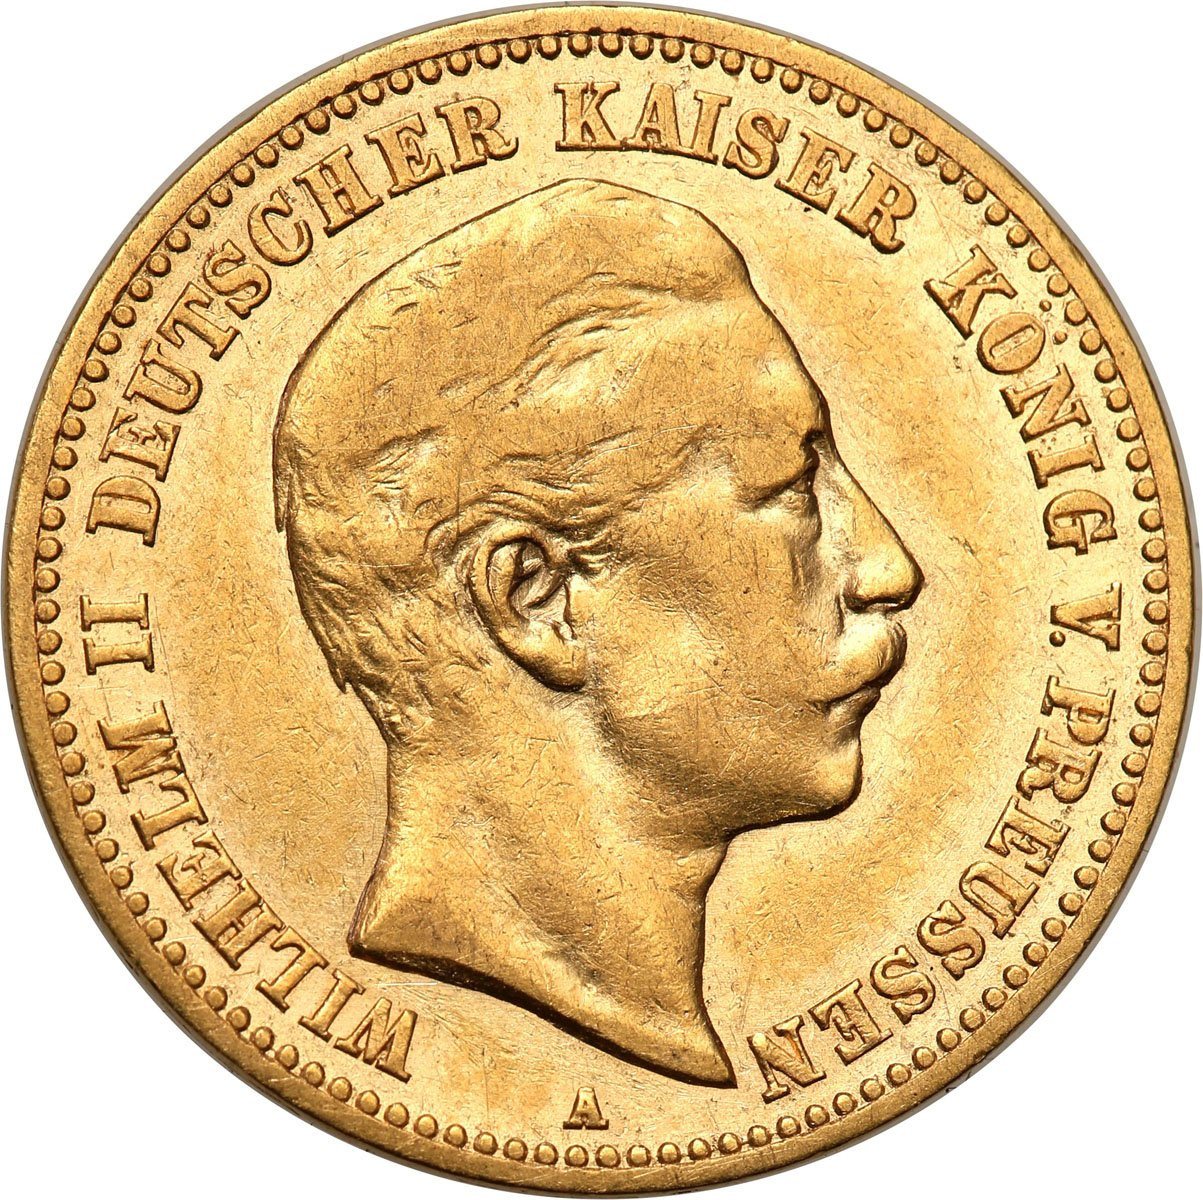 Niemcy Prusy 10 Marek 1890 A wilhelm II st. 2-